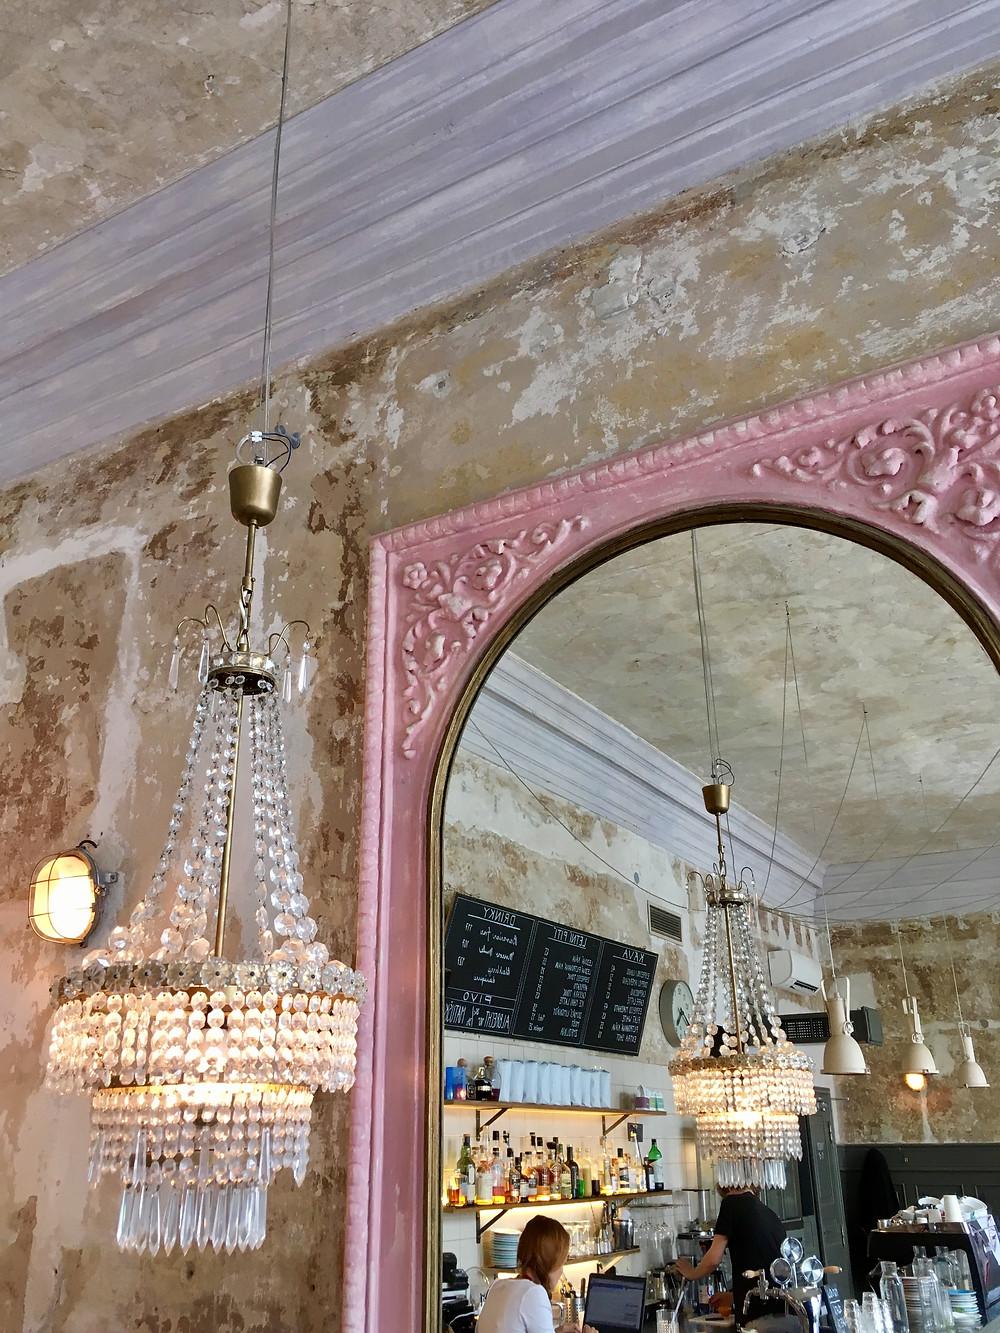 Cafe Letka in Prague